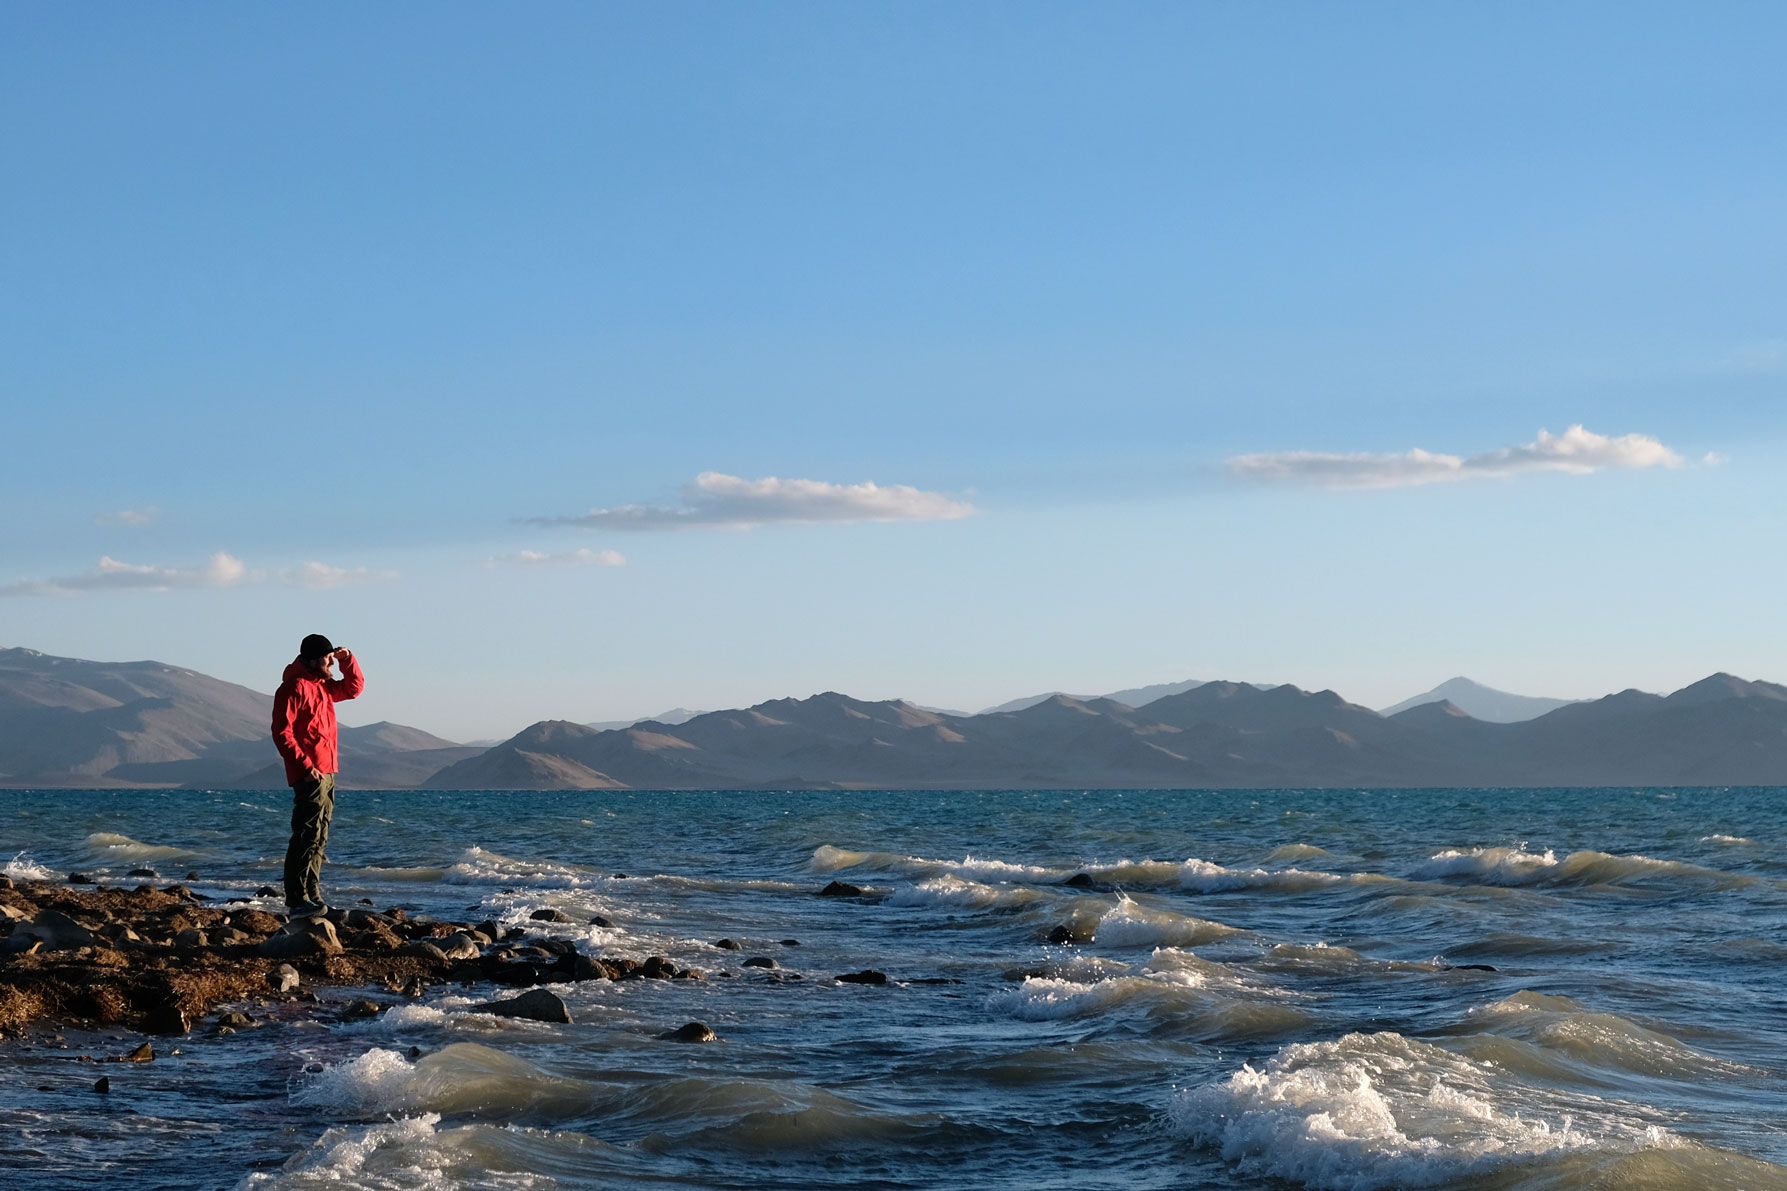 Sebastian am Ufer des Karakul-Sees.